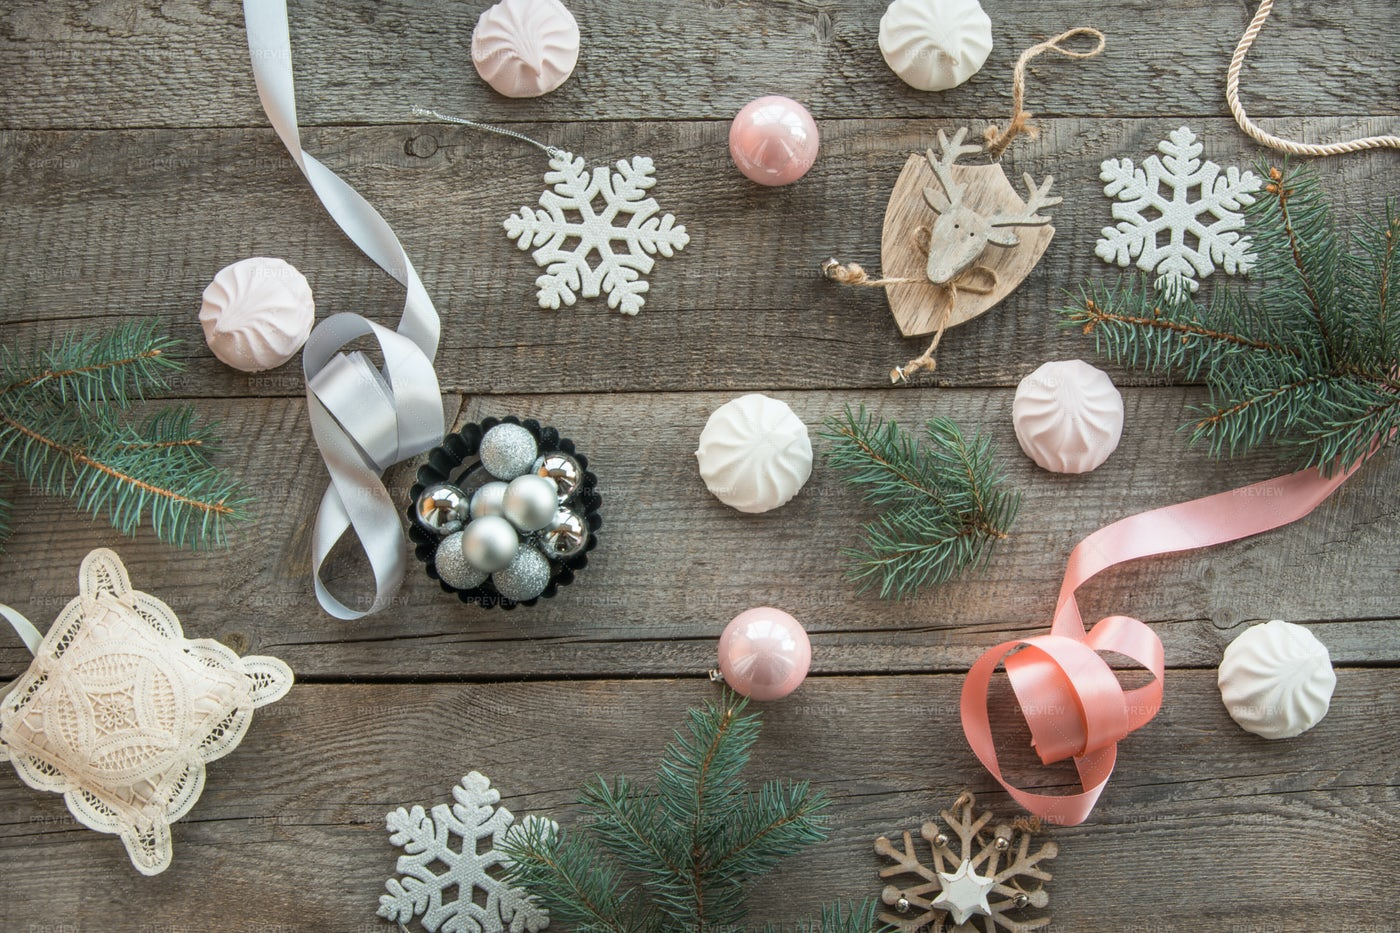 Pastel Christmas Decor: Stock Photos